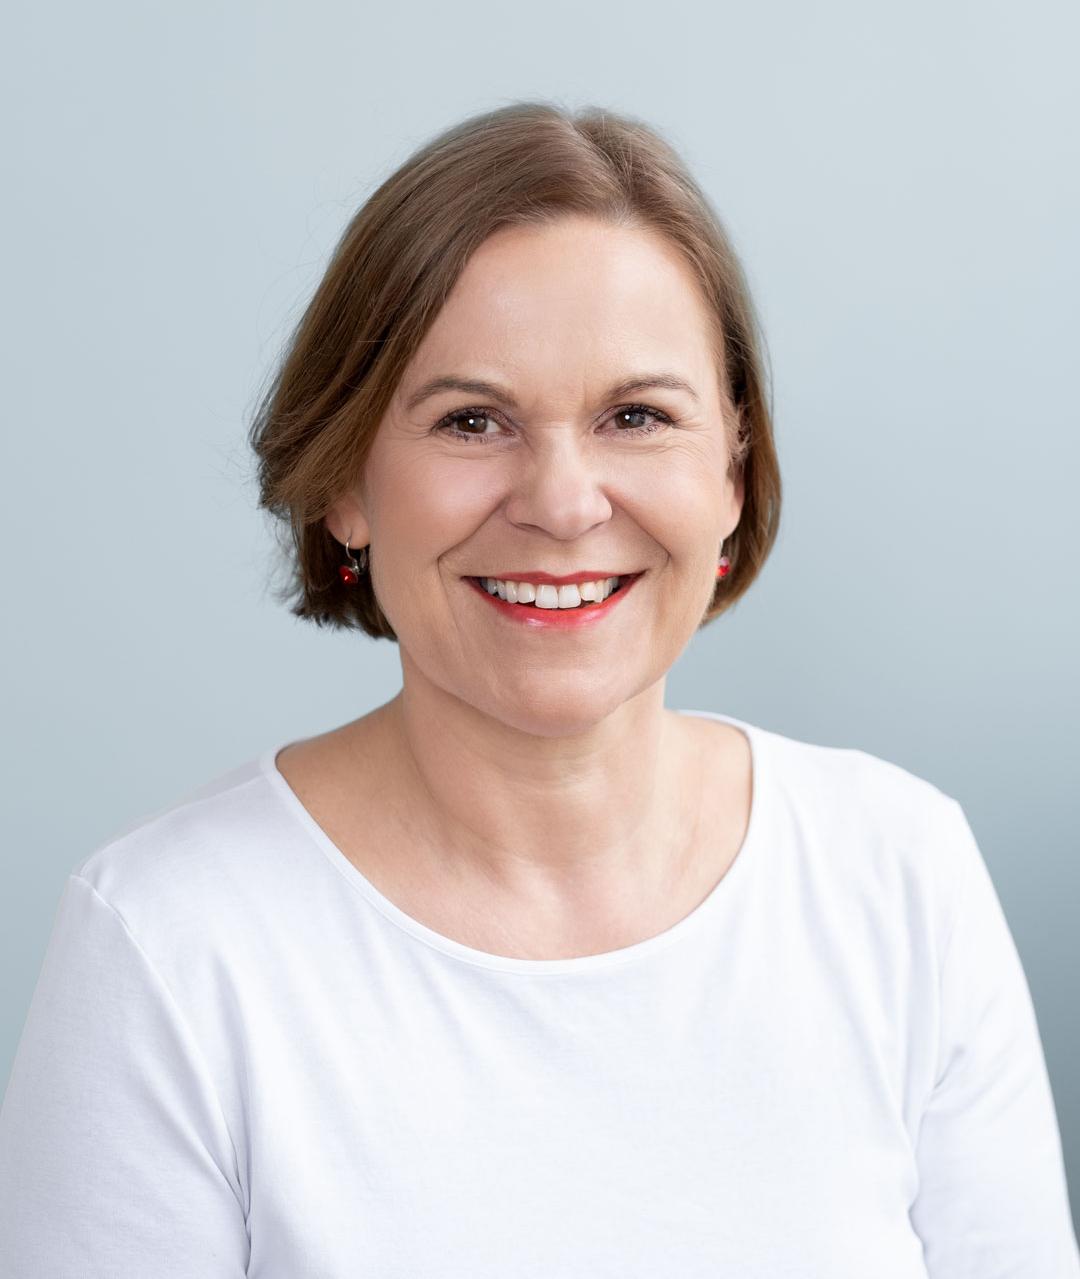 Heidi Klinglmair Gründerin cosmediqua